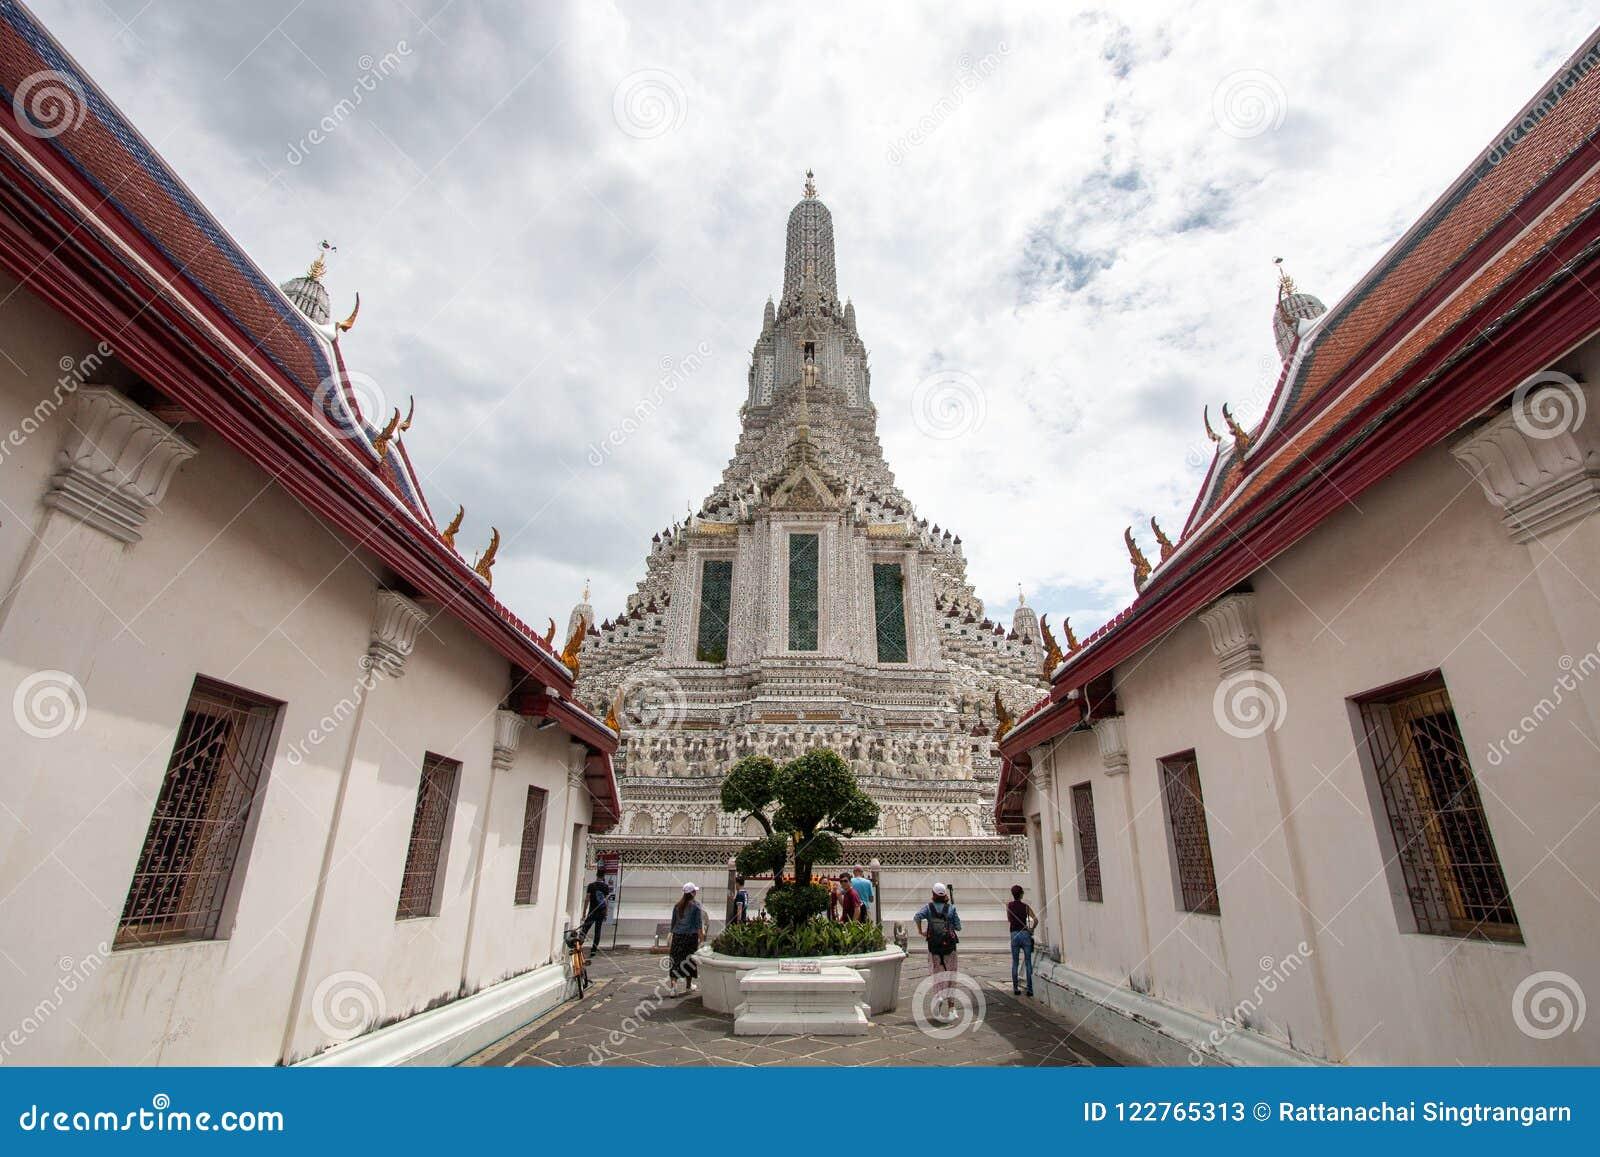 Bangkok Thailand - Juli 9, 2018: Wat Arun Ratchawararam Ratchawaramahawihan eller Wat Arun, buddistisk tempel av gryning berömt f